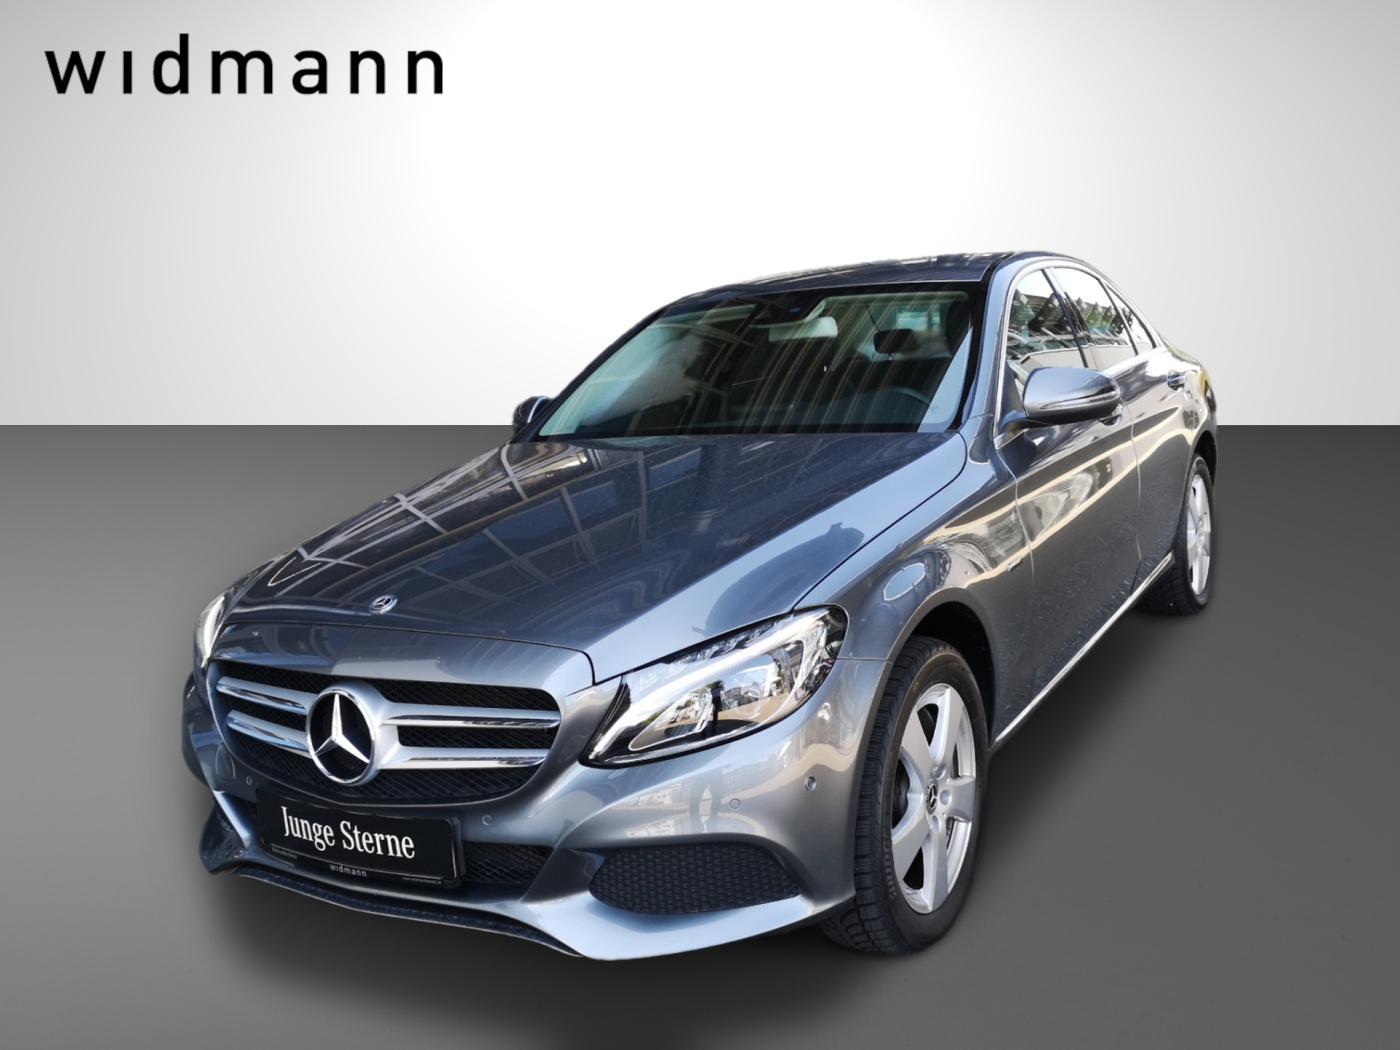 Mercedes-Benz C 350 e *Avantgarde*LED*Navi*Airmatic*Sitzheizg*, Jahr 2018, Hybrid